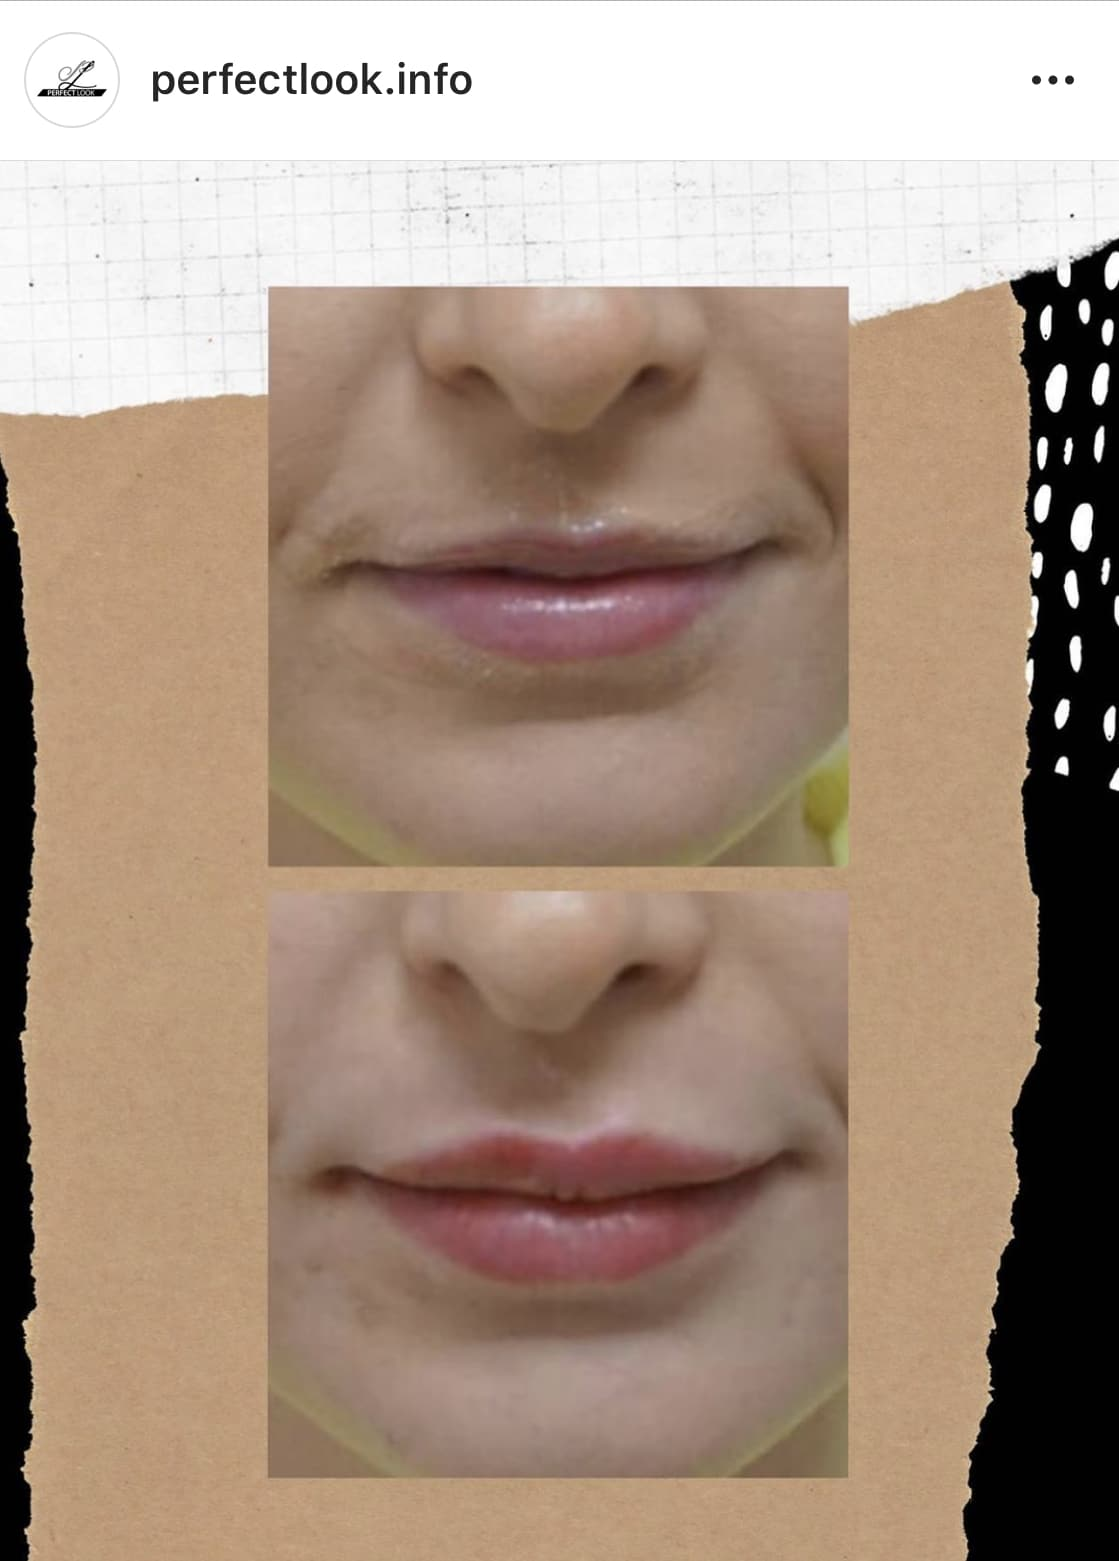 Lippen opvullen met lip fillers in Leeuwarden